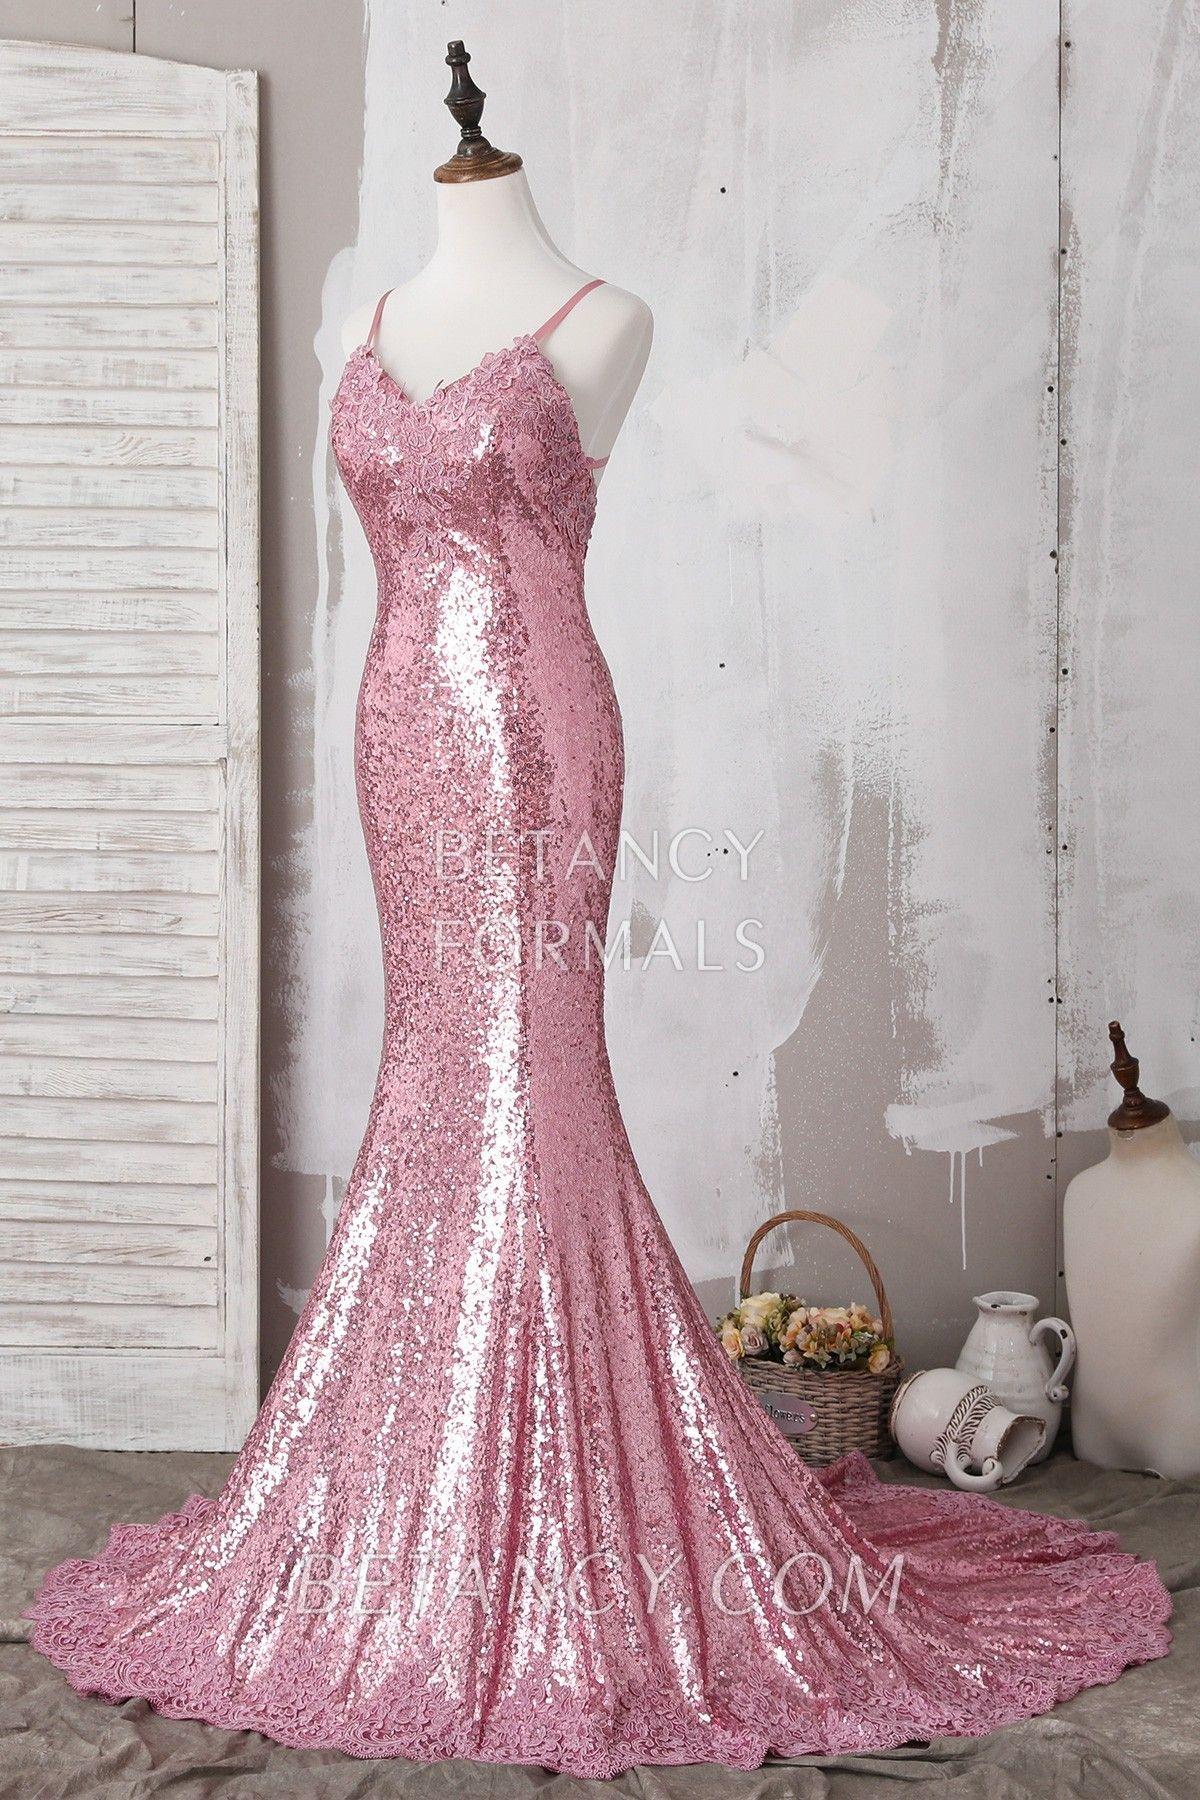 c1298b94b780 Elegant Pink Lace Appliqued Sequin Spaghetti Strap V Neck Mermaid ...